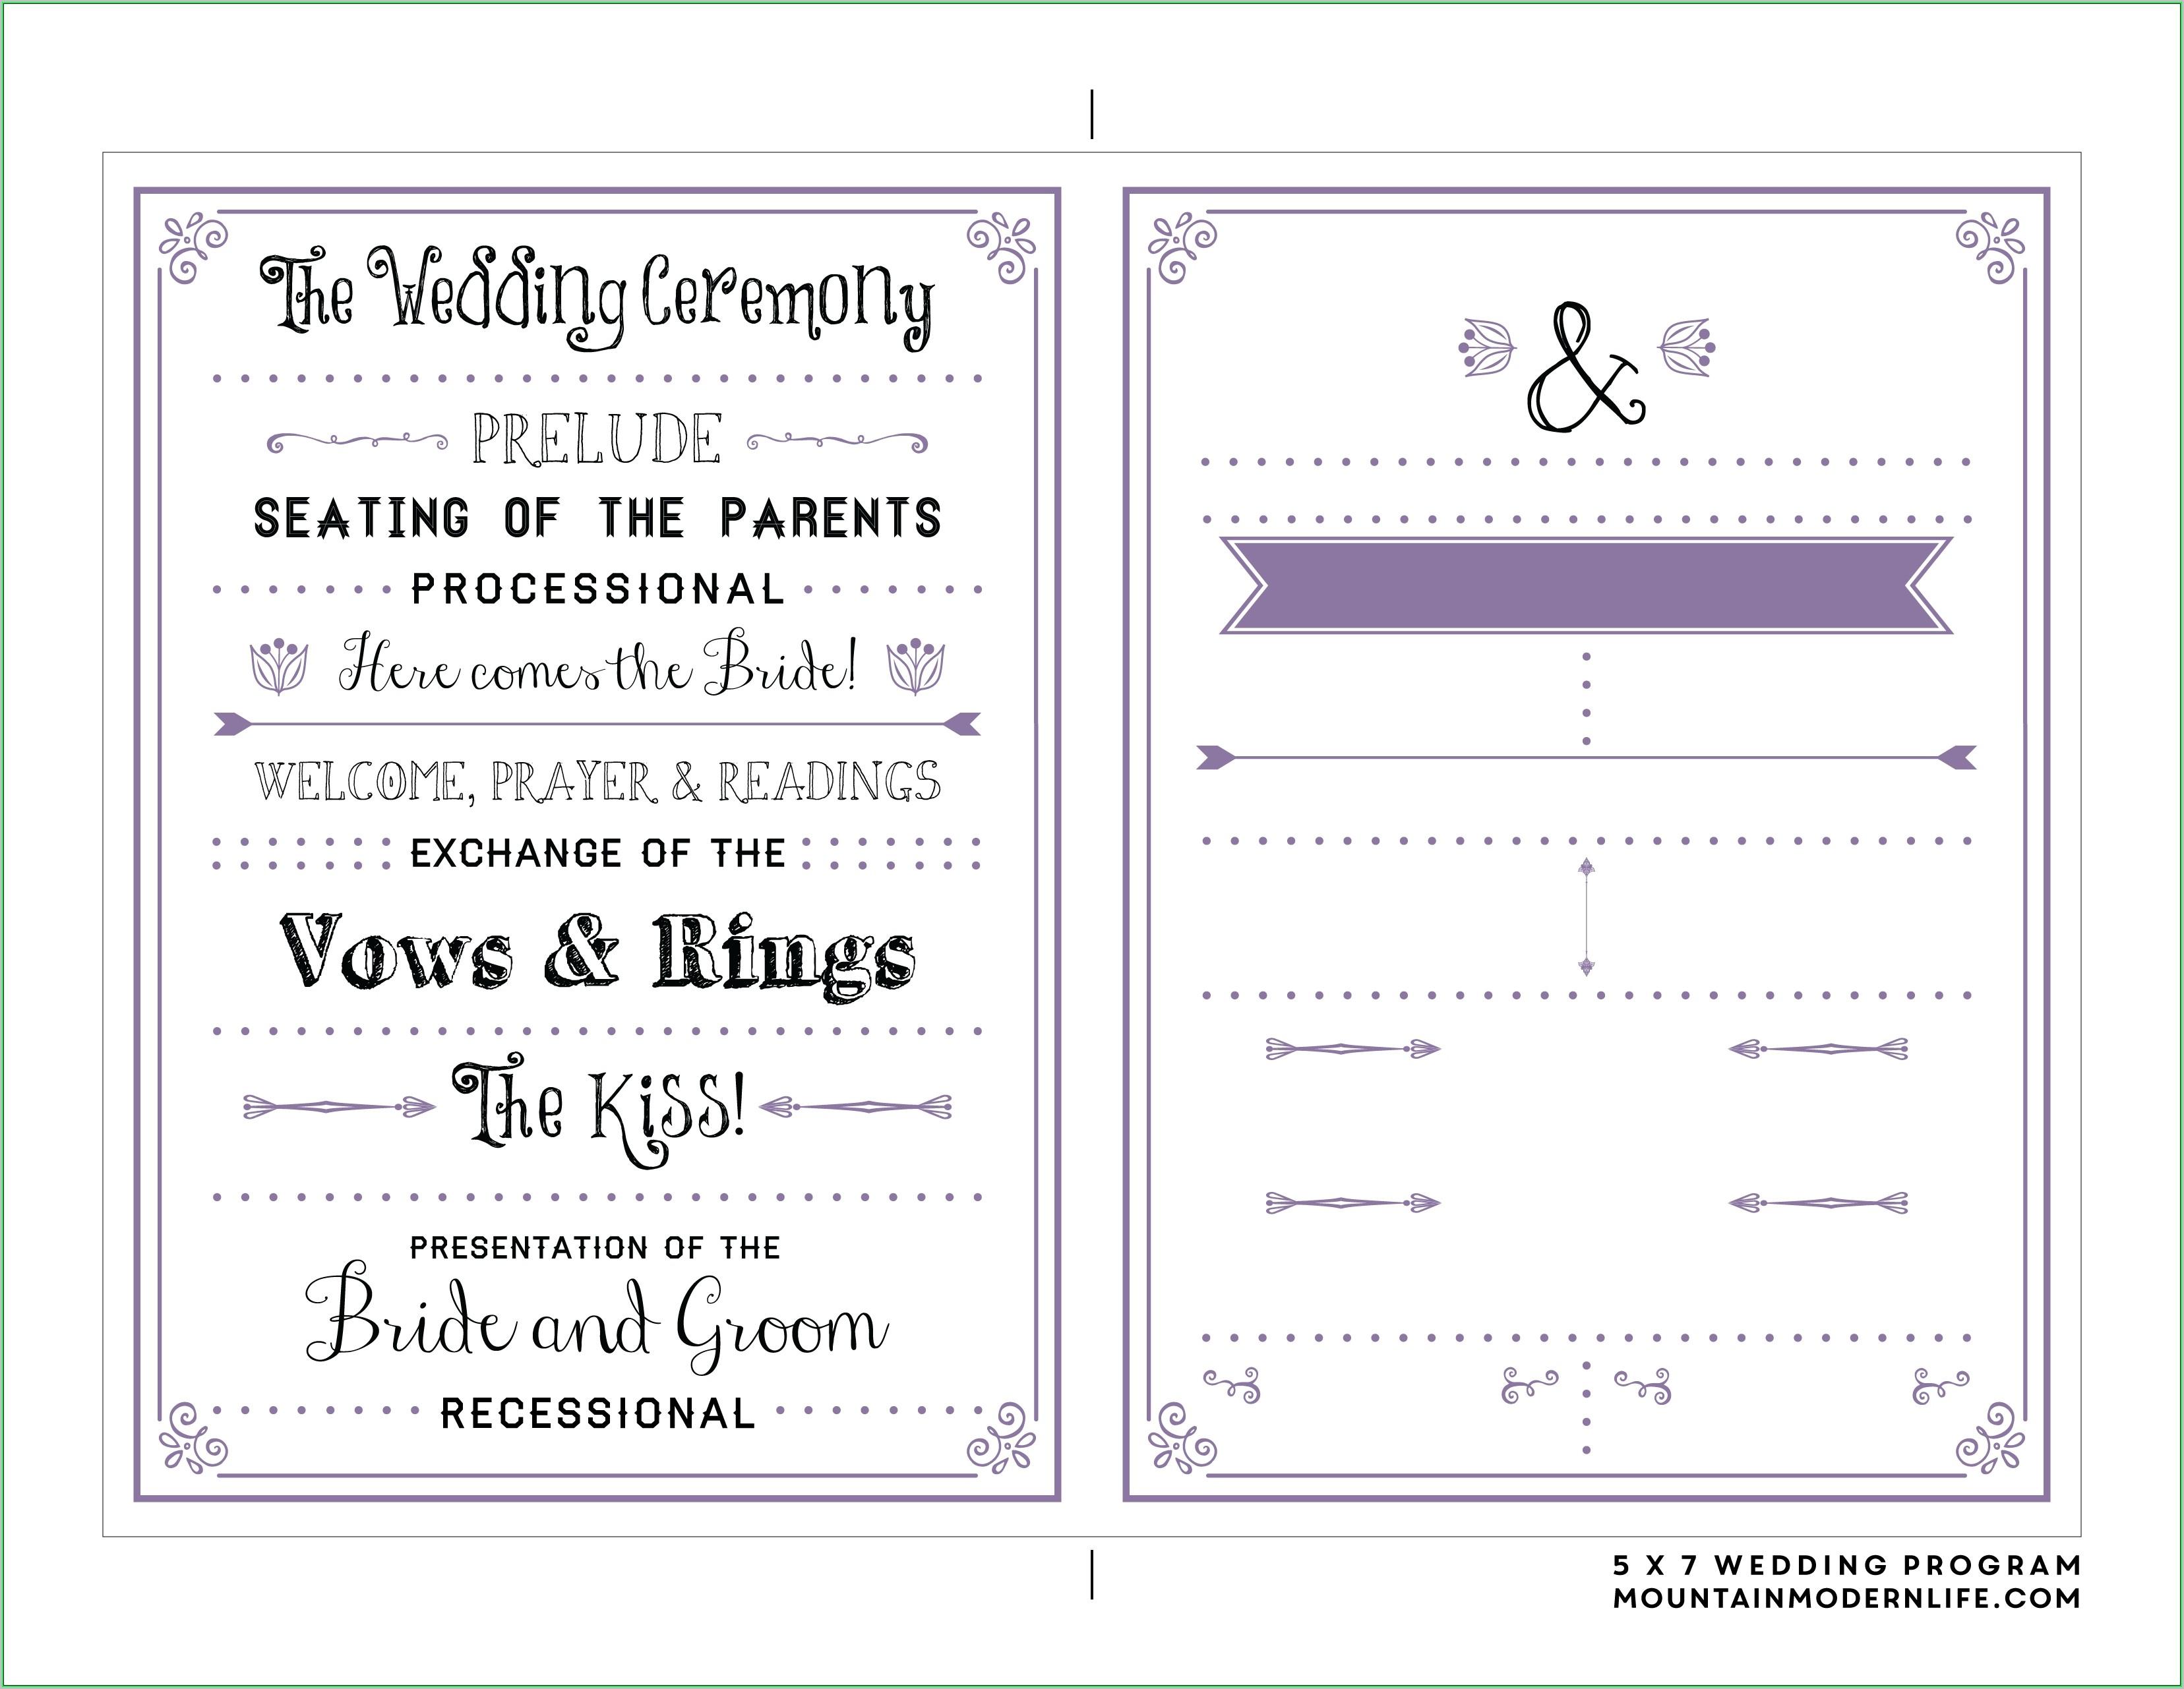 005 Free Printable Wedding Program Templates Template Ideas - Free Printable Wedding Program Samples